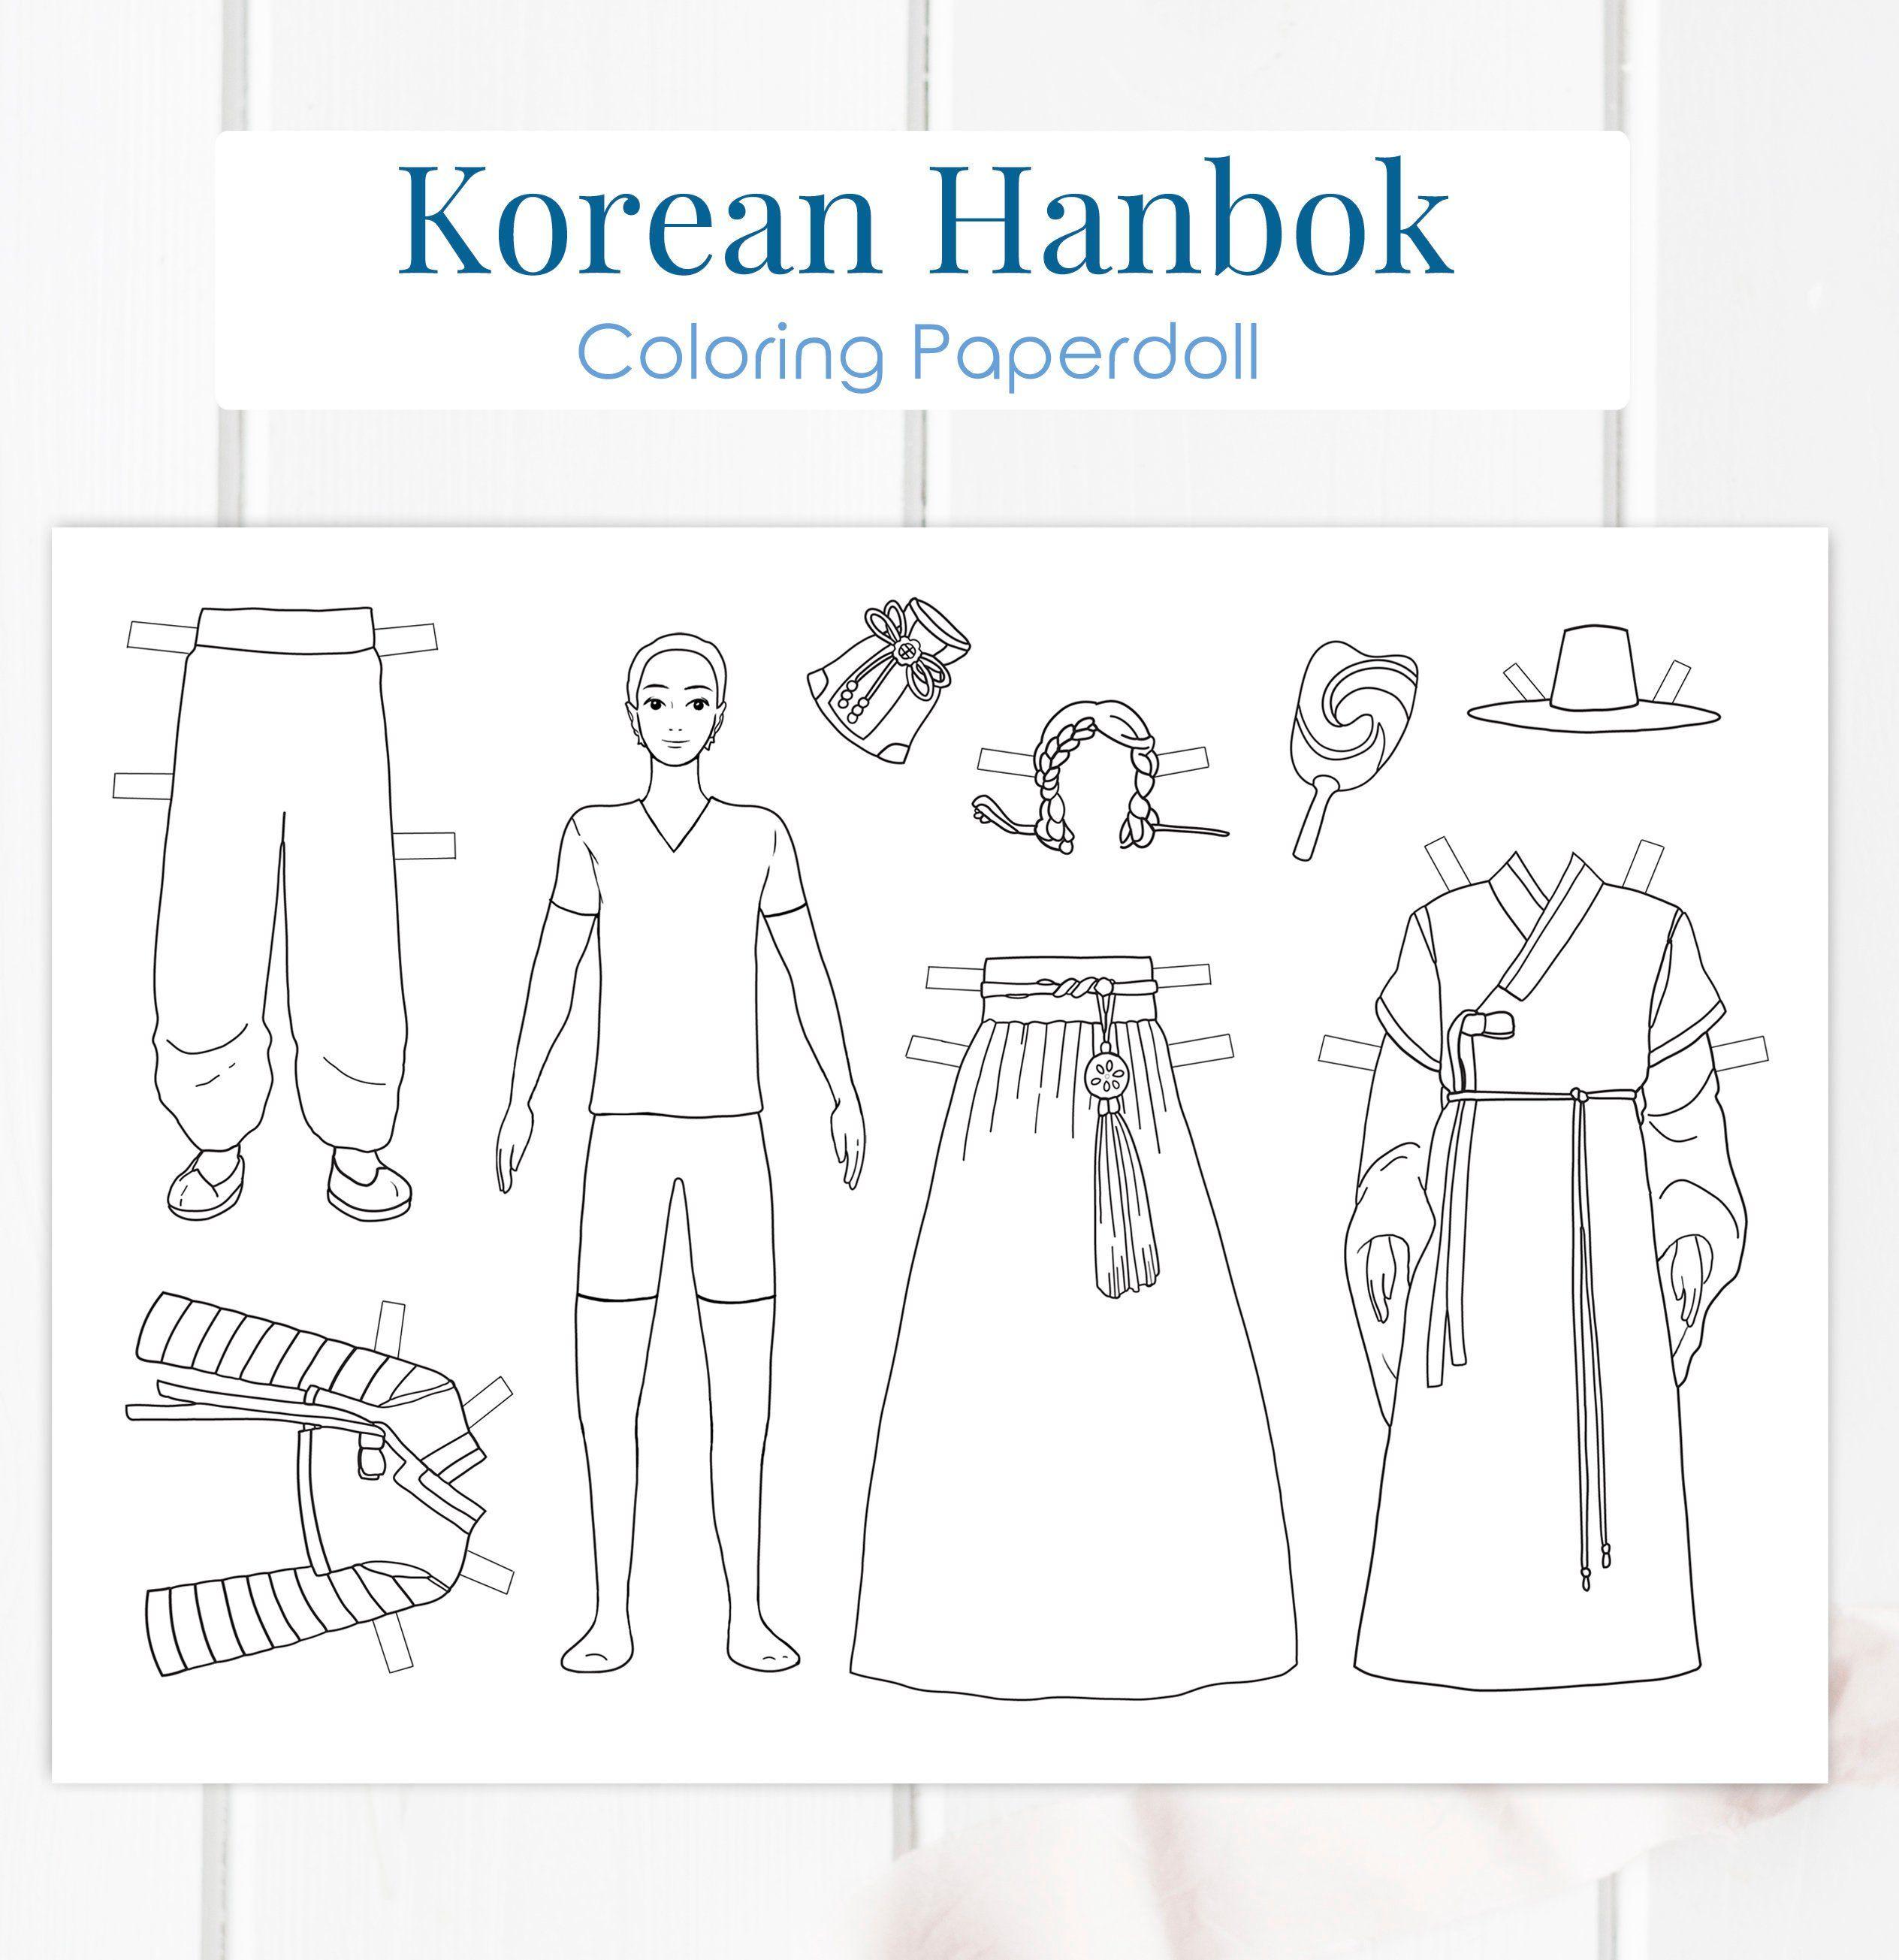 Korean Hanbok Paperdoll Printable Traditional Korea Coloring Page Digital Download Paper Doll Diy Project For Kids Pdf Jpg In 2021 Hanbok Paper Dolls Korean Hanbok